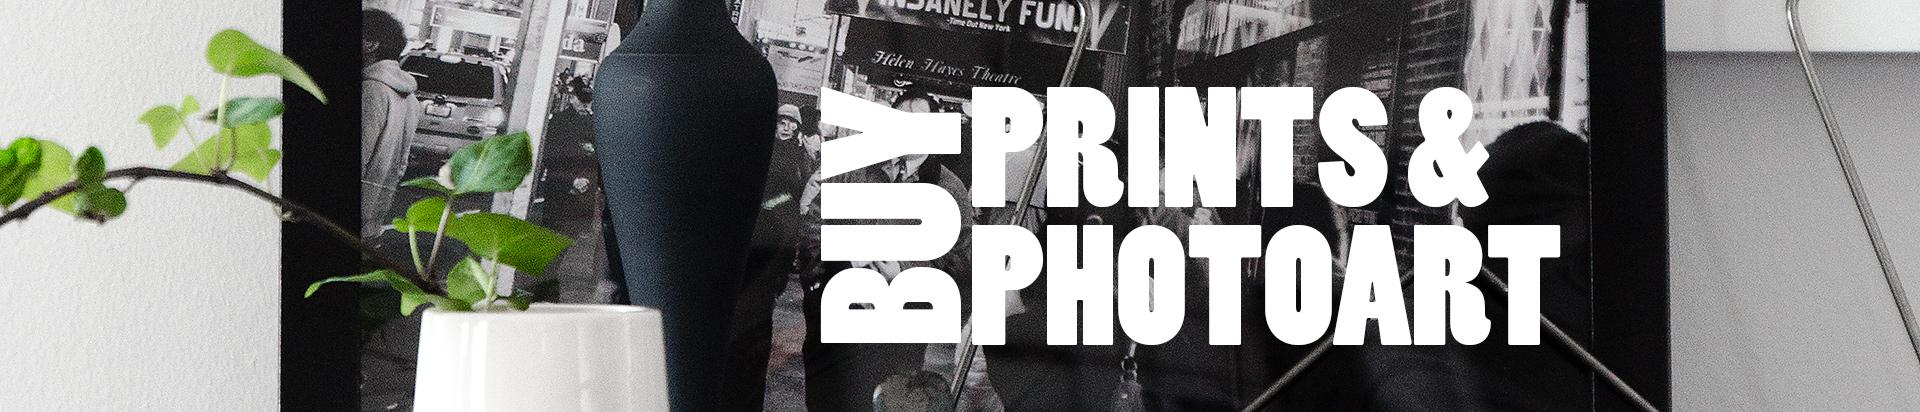 buy prints and photoart